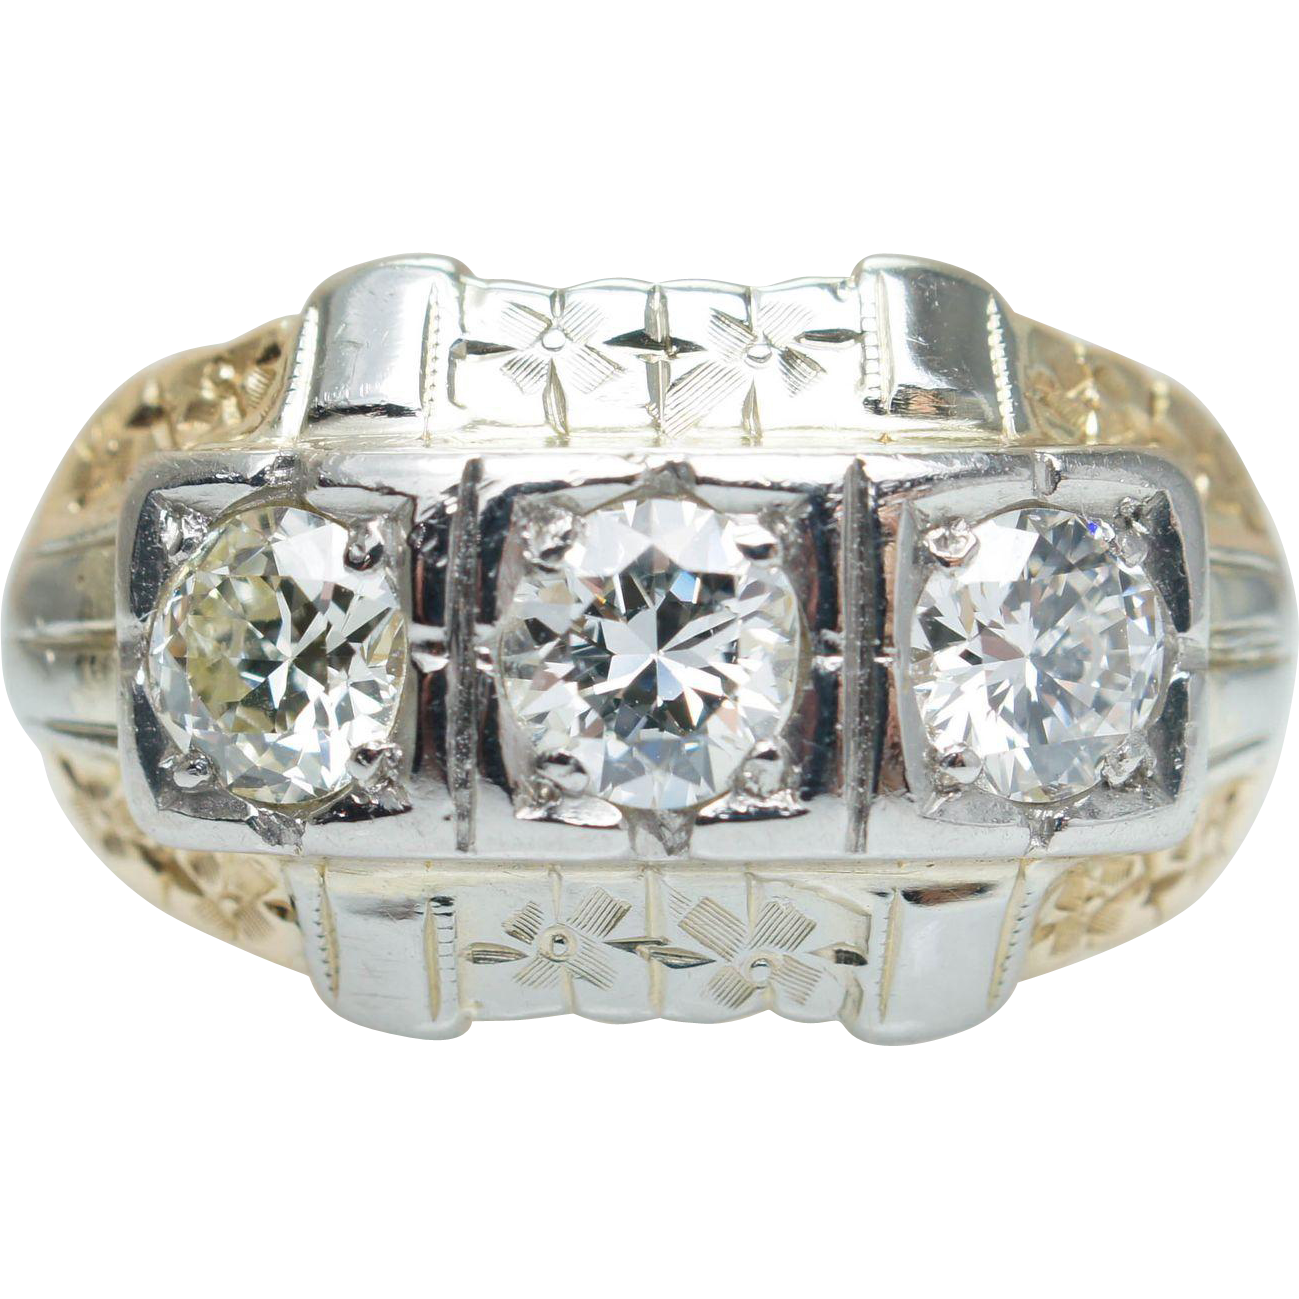 Vintage .77CT Diamond Cocktail Ring 14k Yellow & White Gold